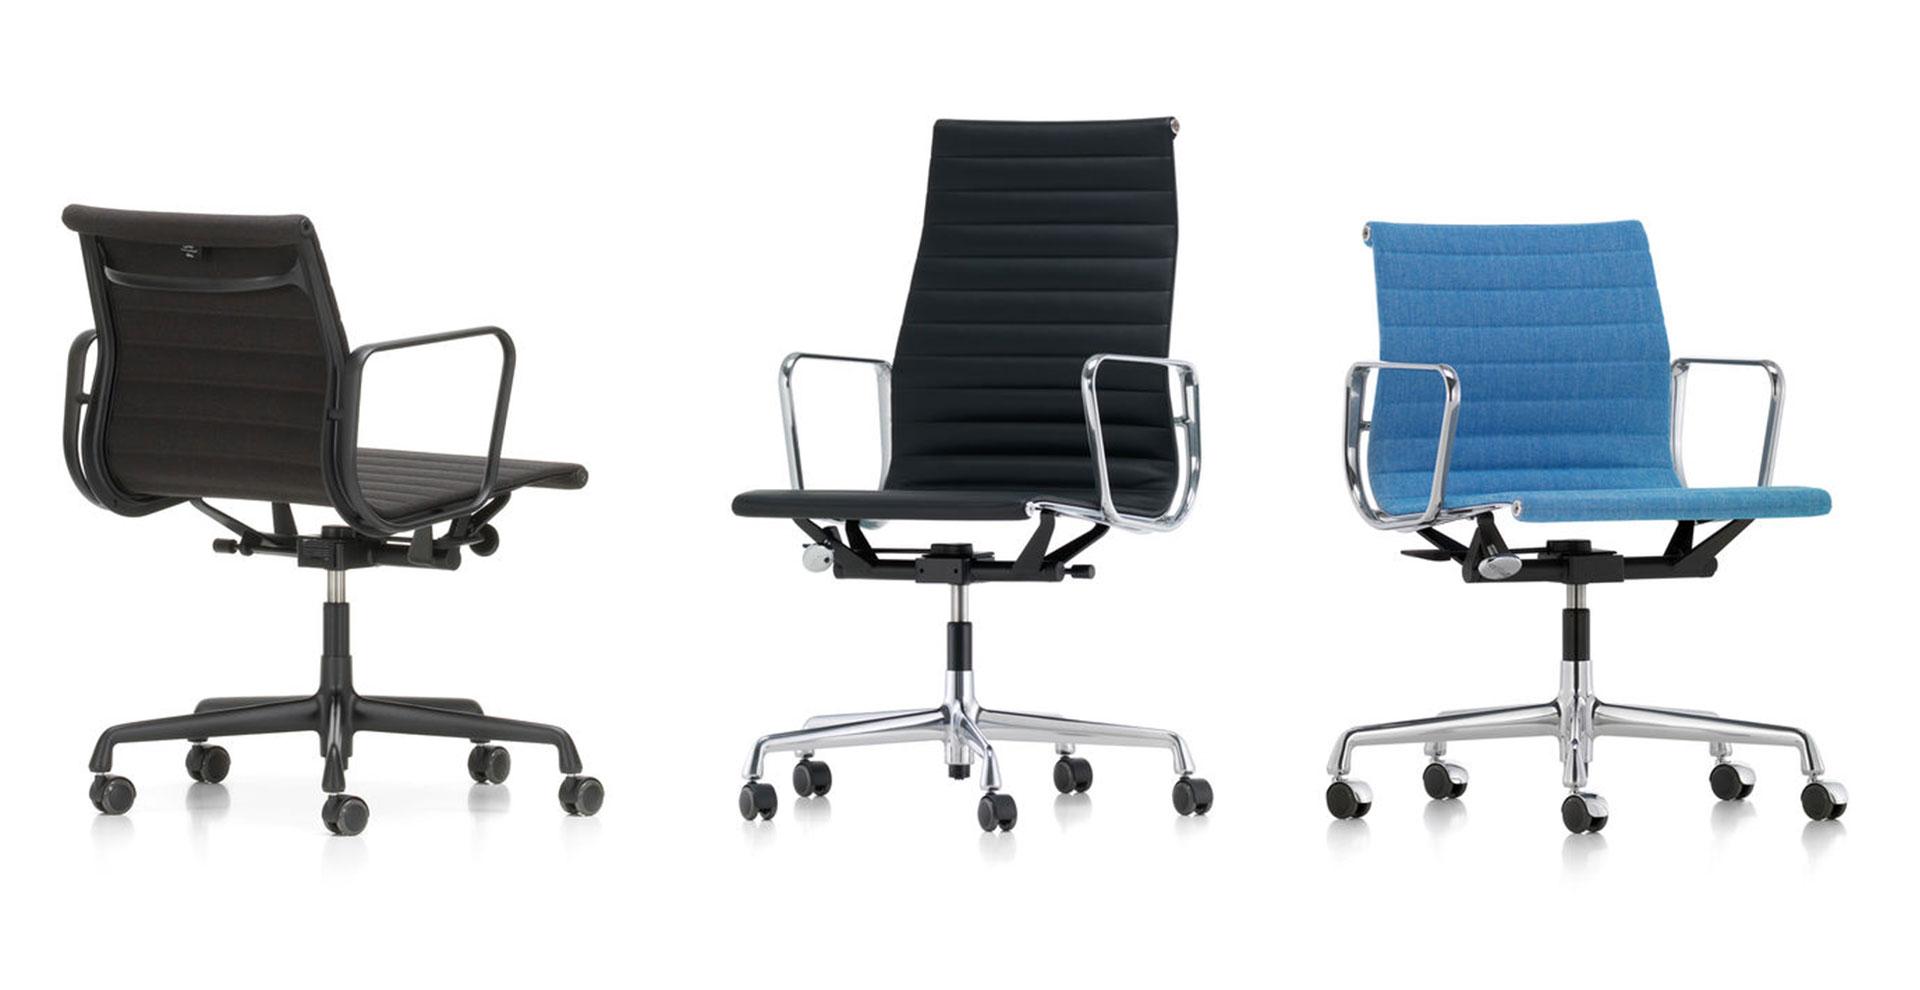 Aluminium group vitra sedie aluminium group vitra for Sedie design vitra